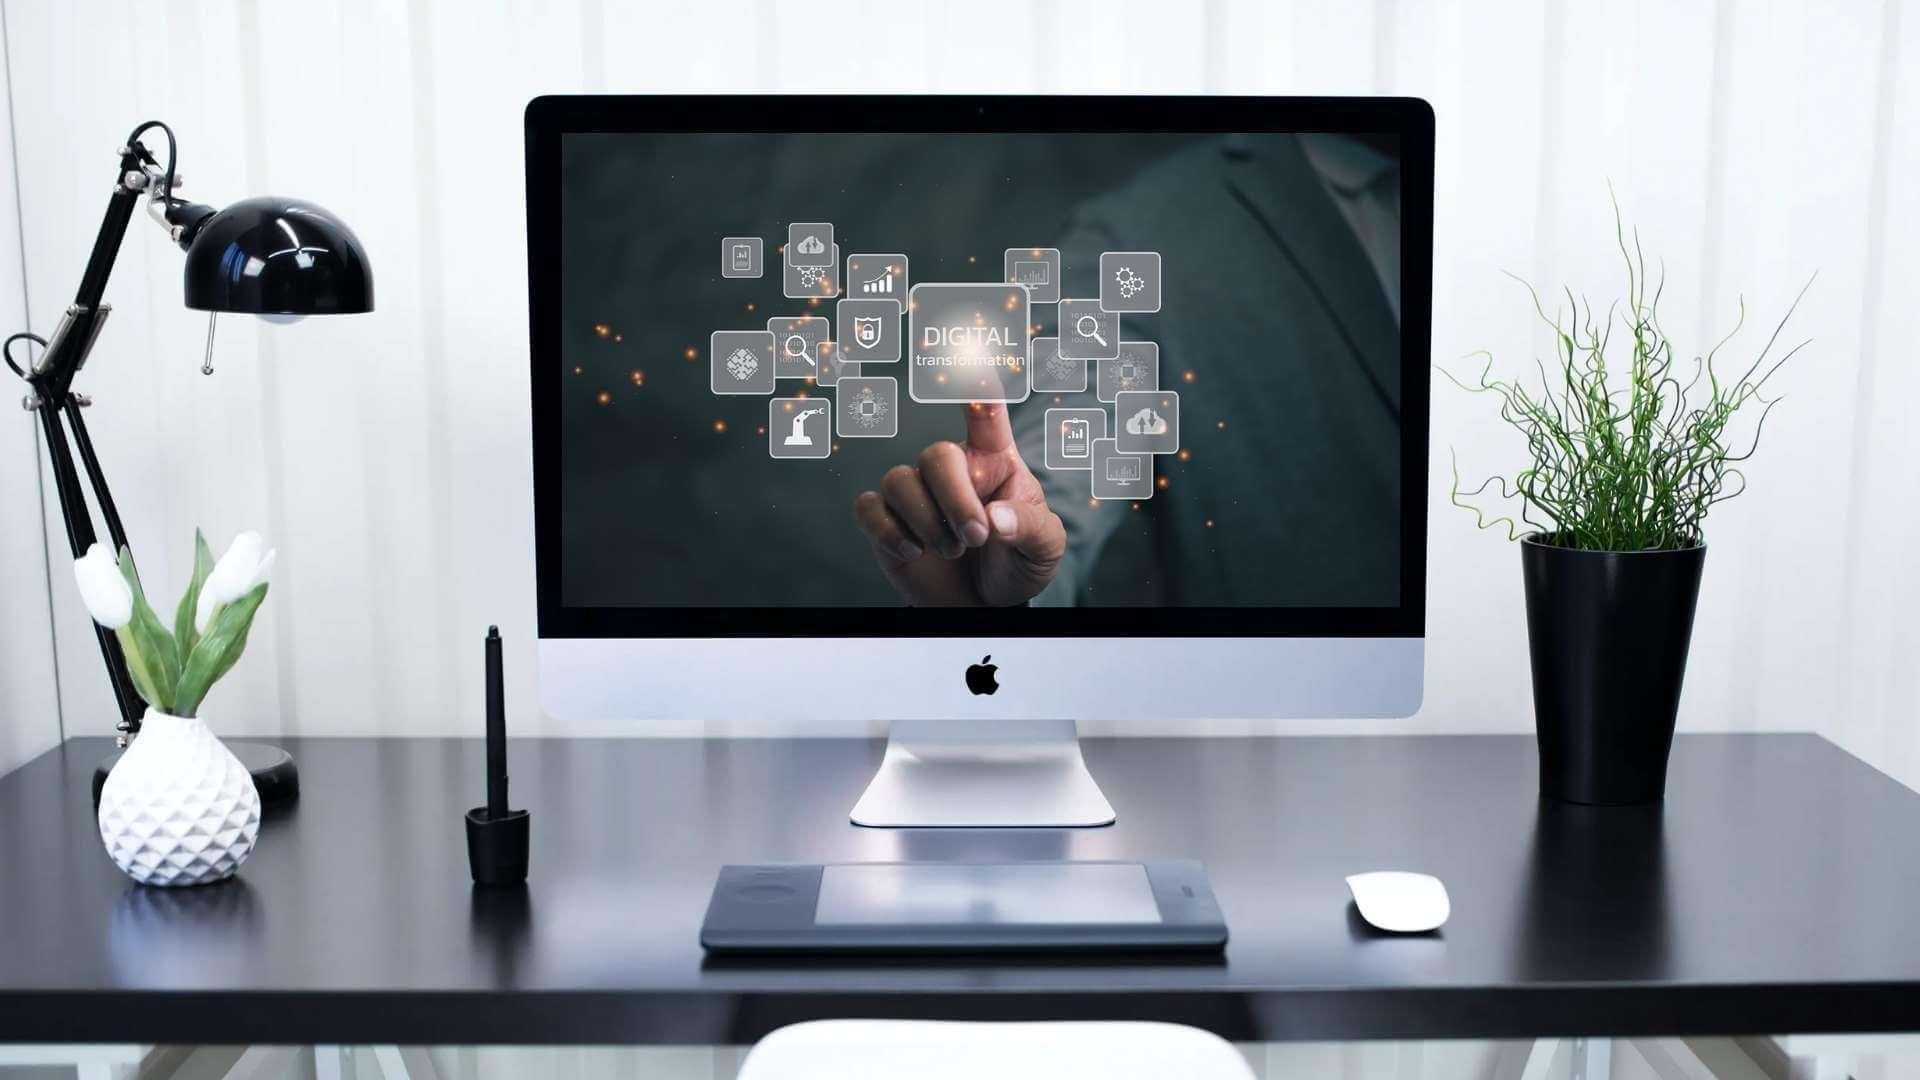 desktop computer showing digital transformation written on the screen